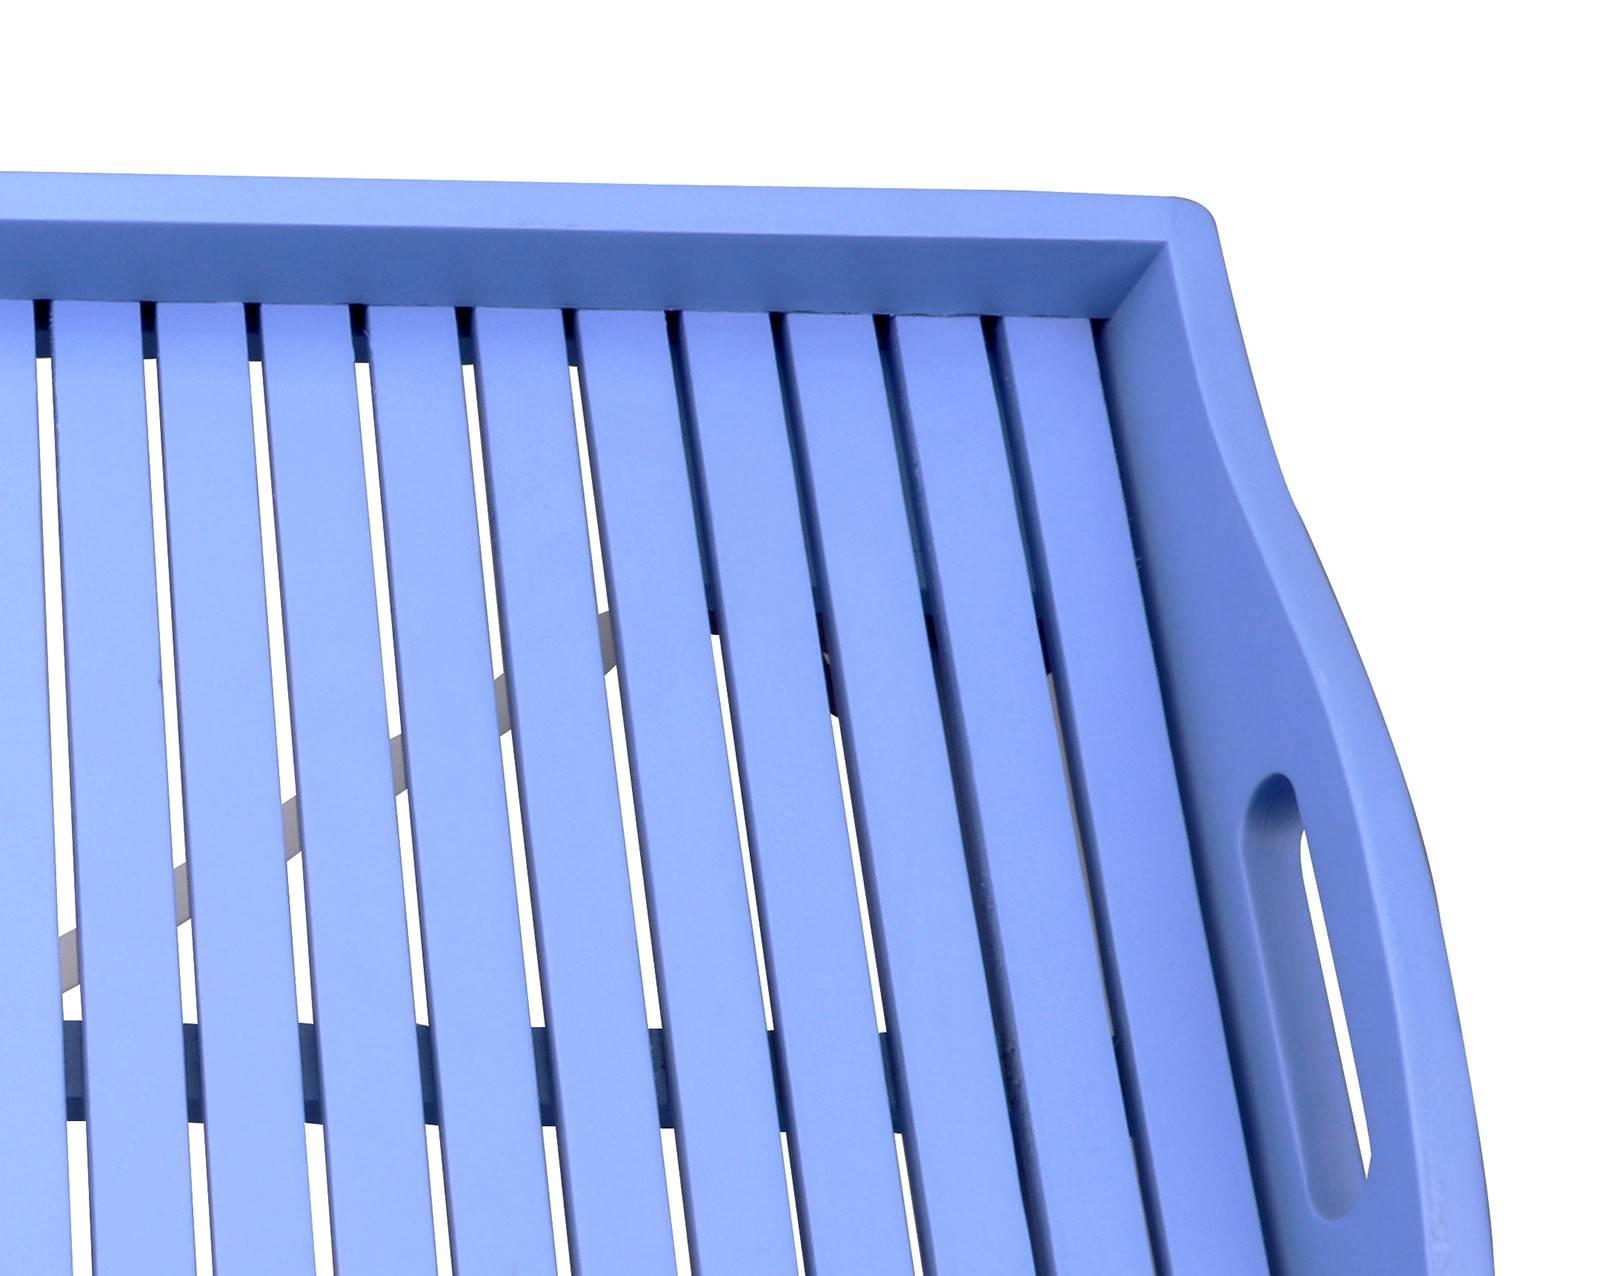 Hardwood Butlers Tray - Blue